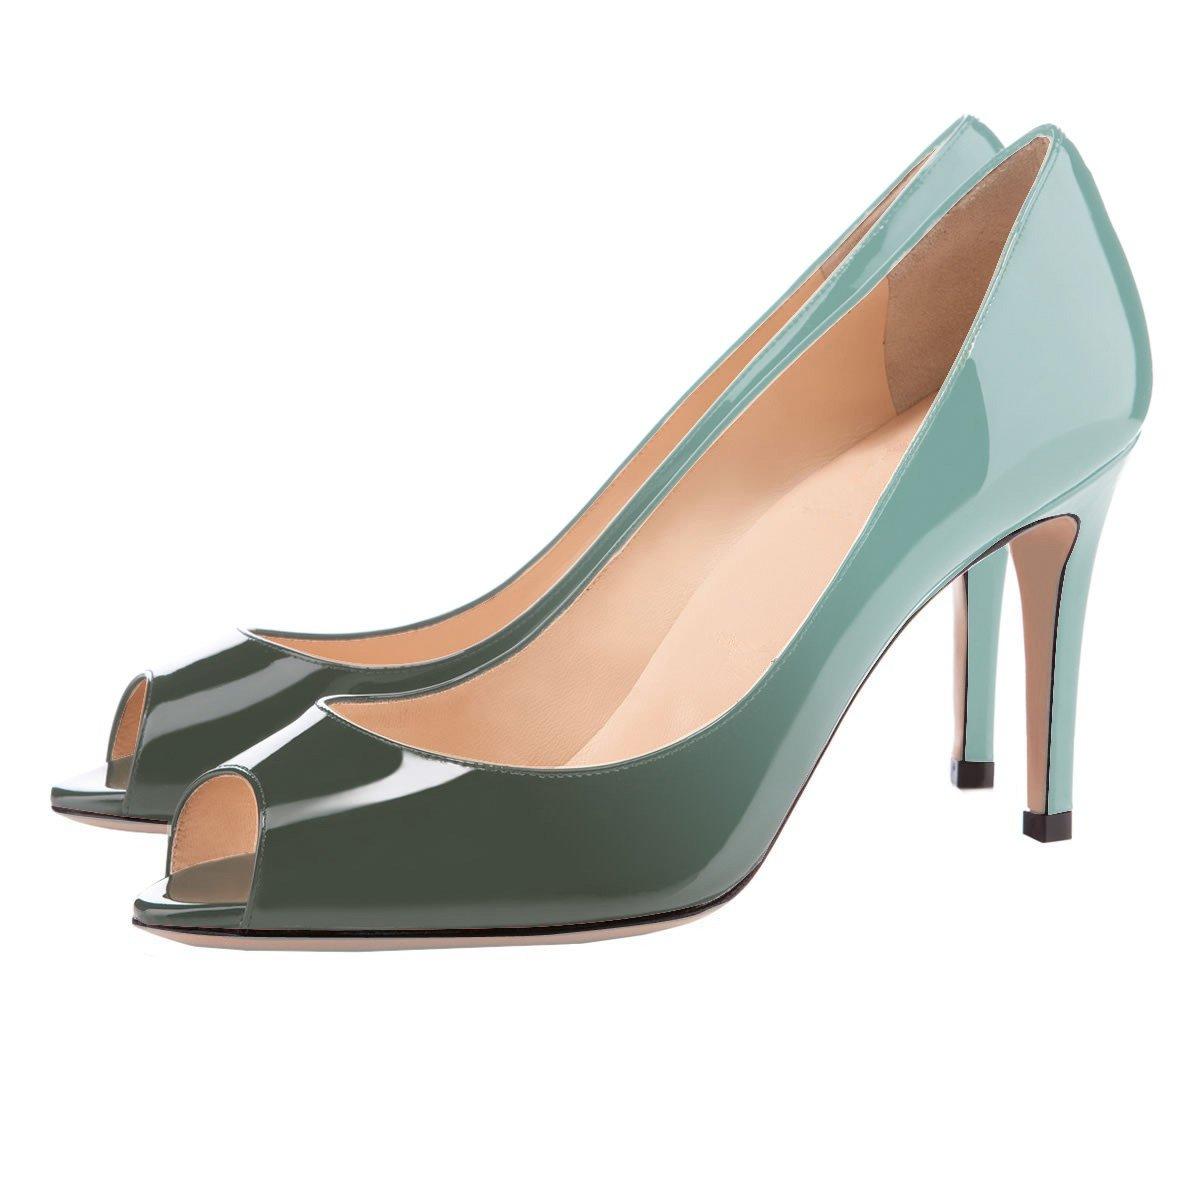 Eldof Women Peep Toe Pumps Mid-Heel Pumps Formal Wedding Bridal Classic Heel Open Toe Stiletto B07F8N6ZZ9 5 B(M) US|Emerald